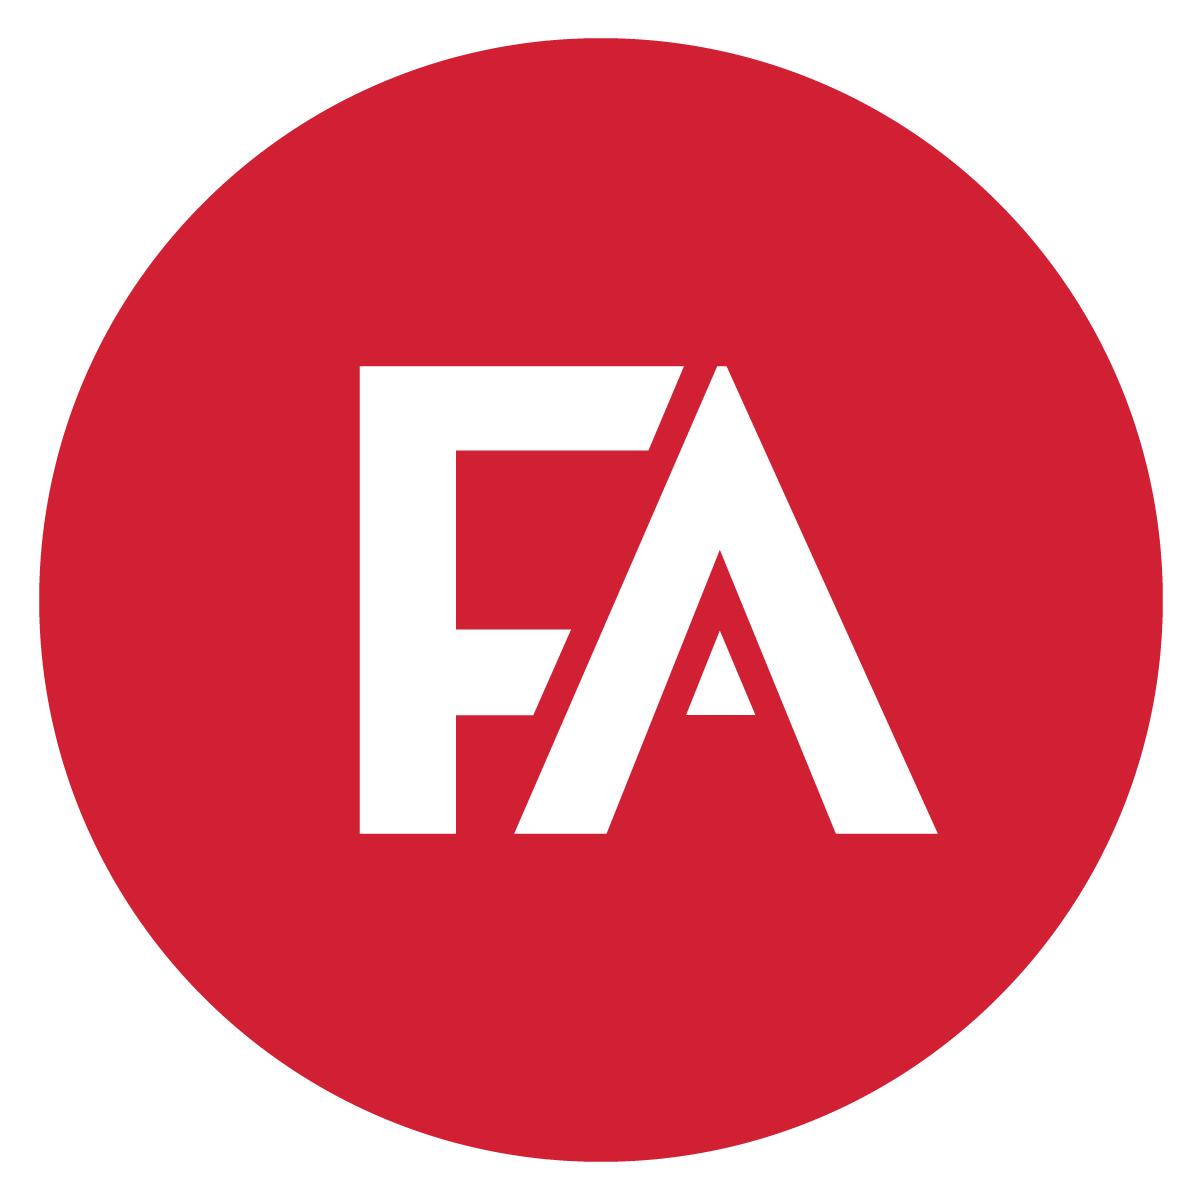 FA-stamp-logo